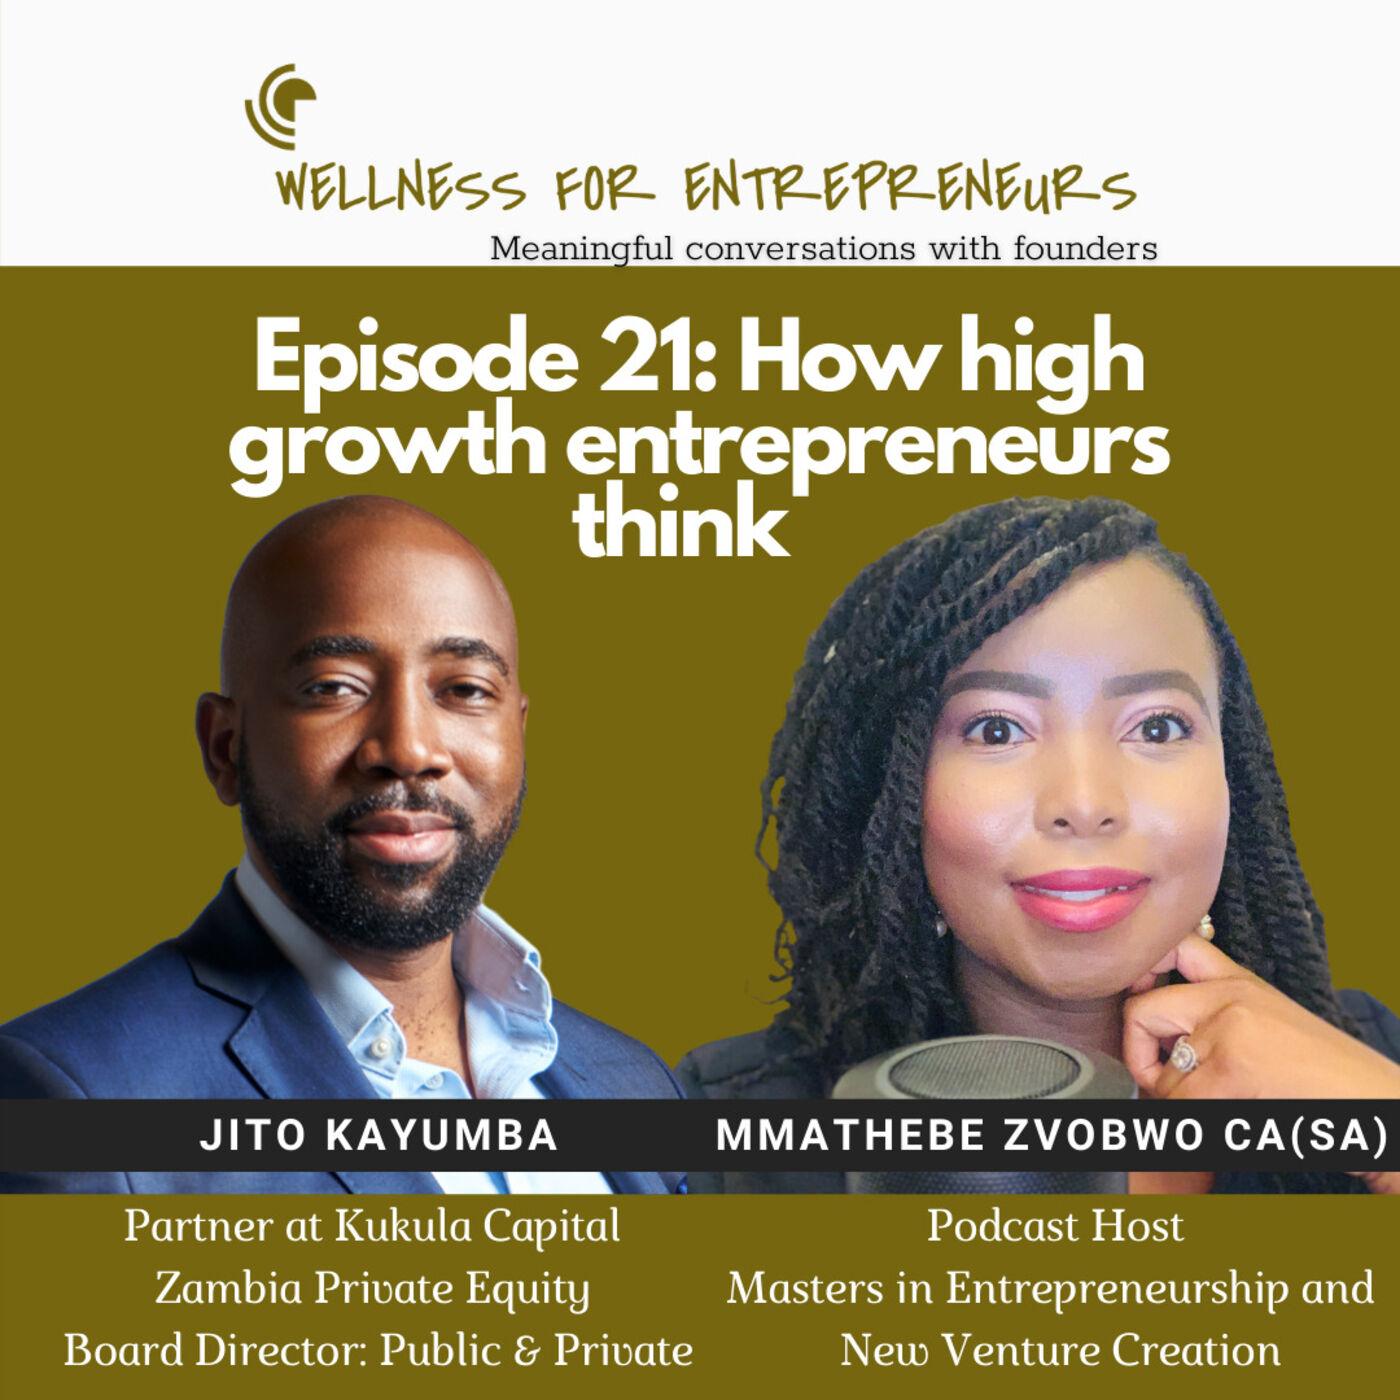 Episode 21: How high growth entrepreneurs think, with Jito Kayumba